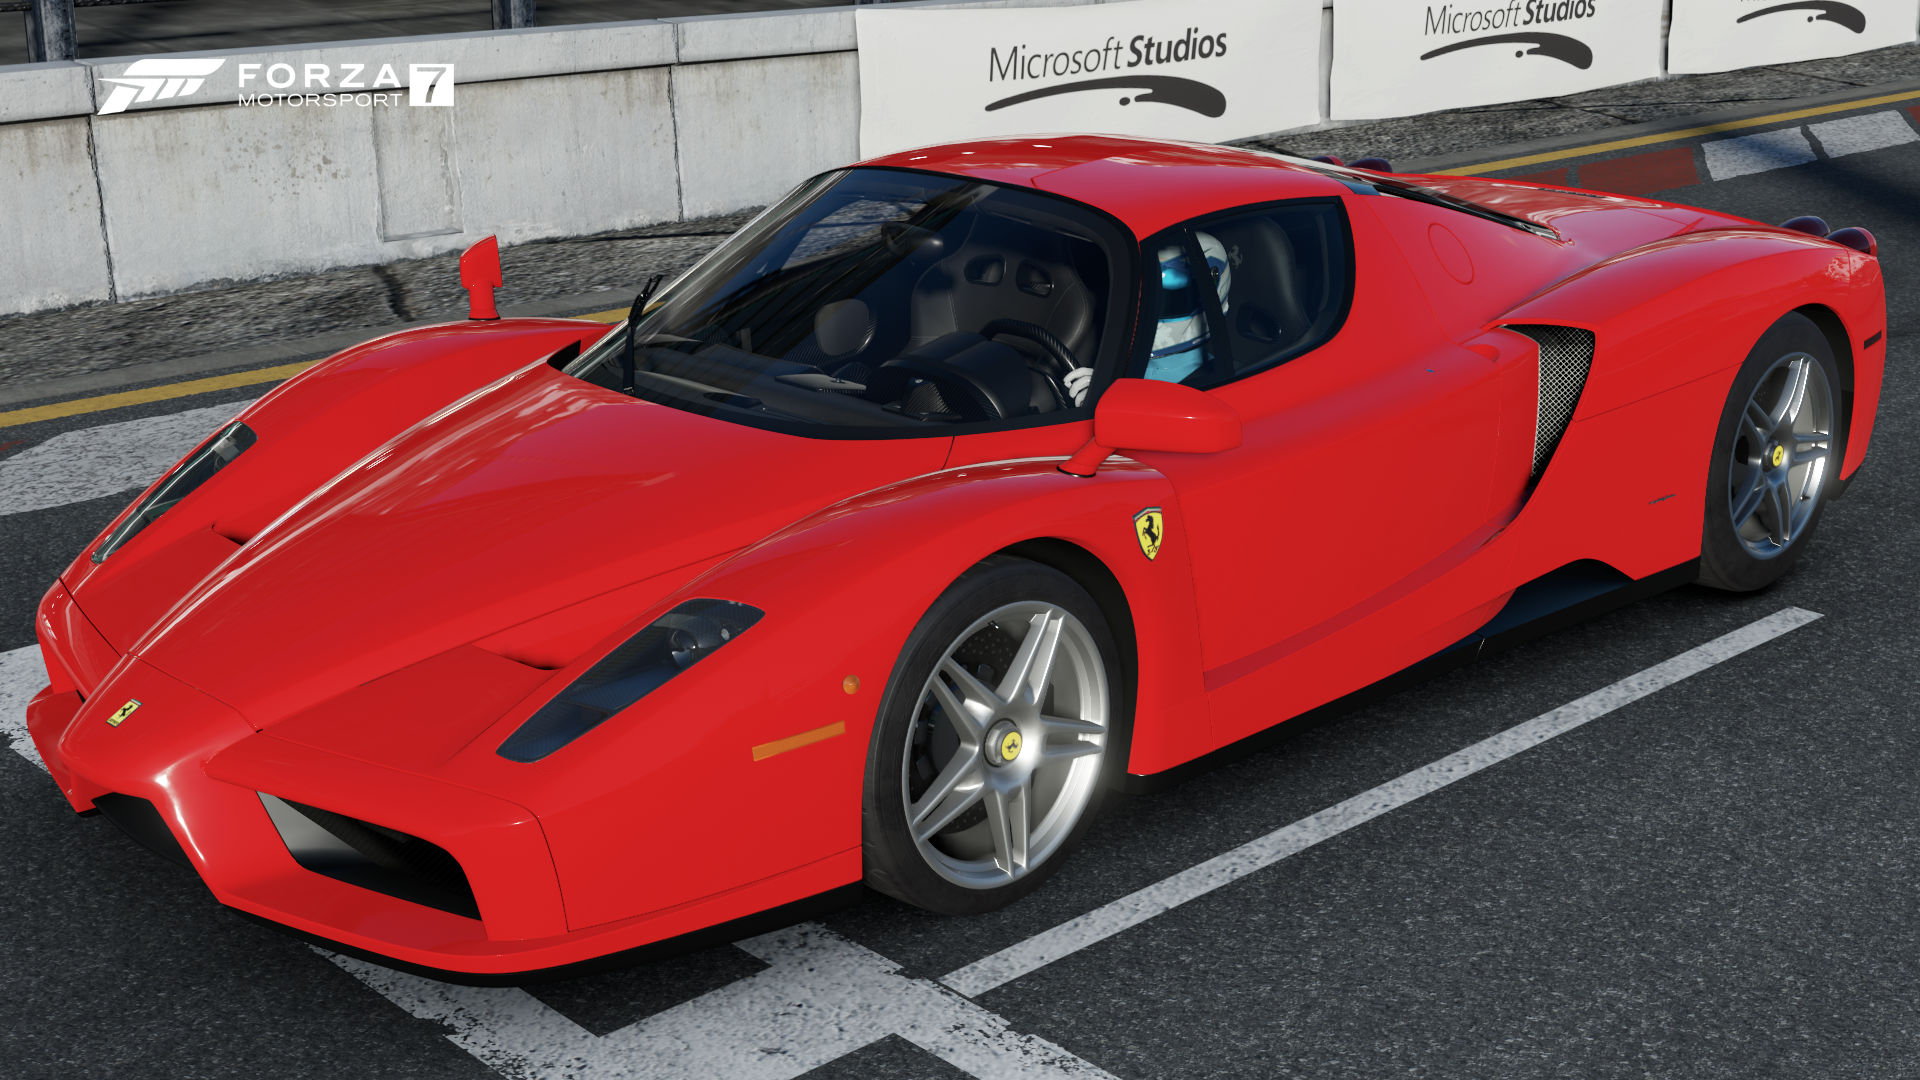 Ferrari Enzo Ferrari | Forza Motorsport Wiki | FANDOM powered by Wikia